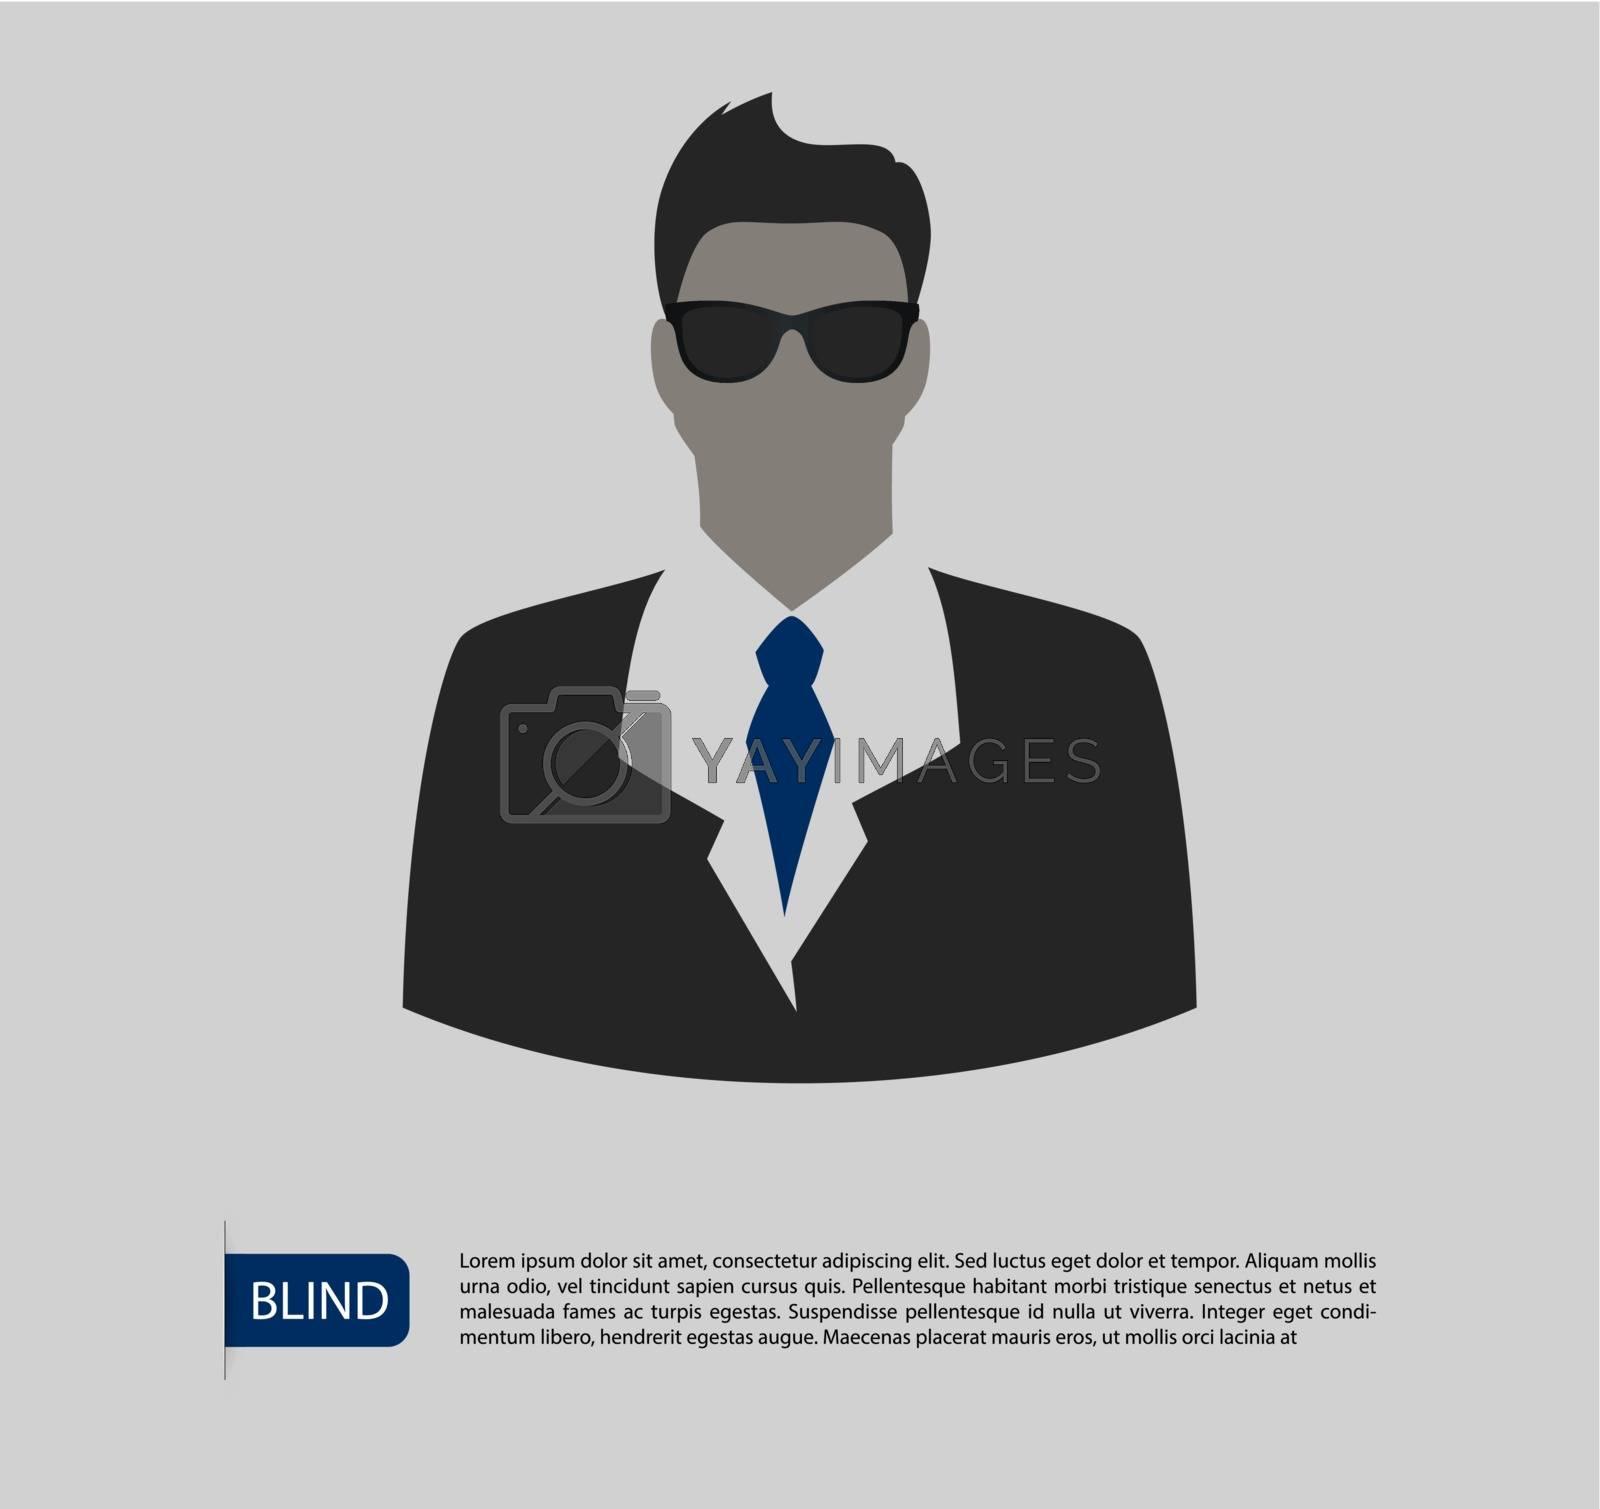 Vector illustration of Blind man silhouette image